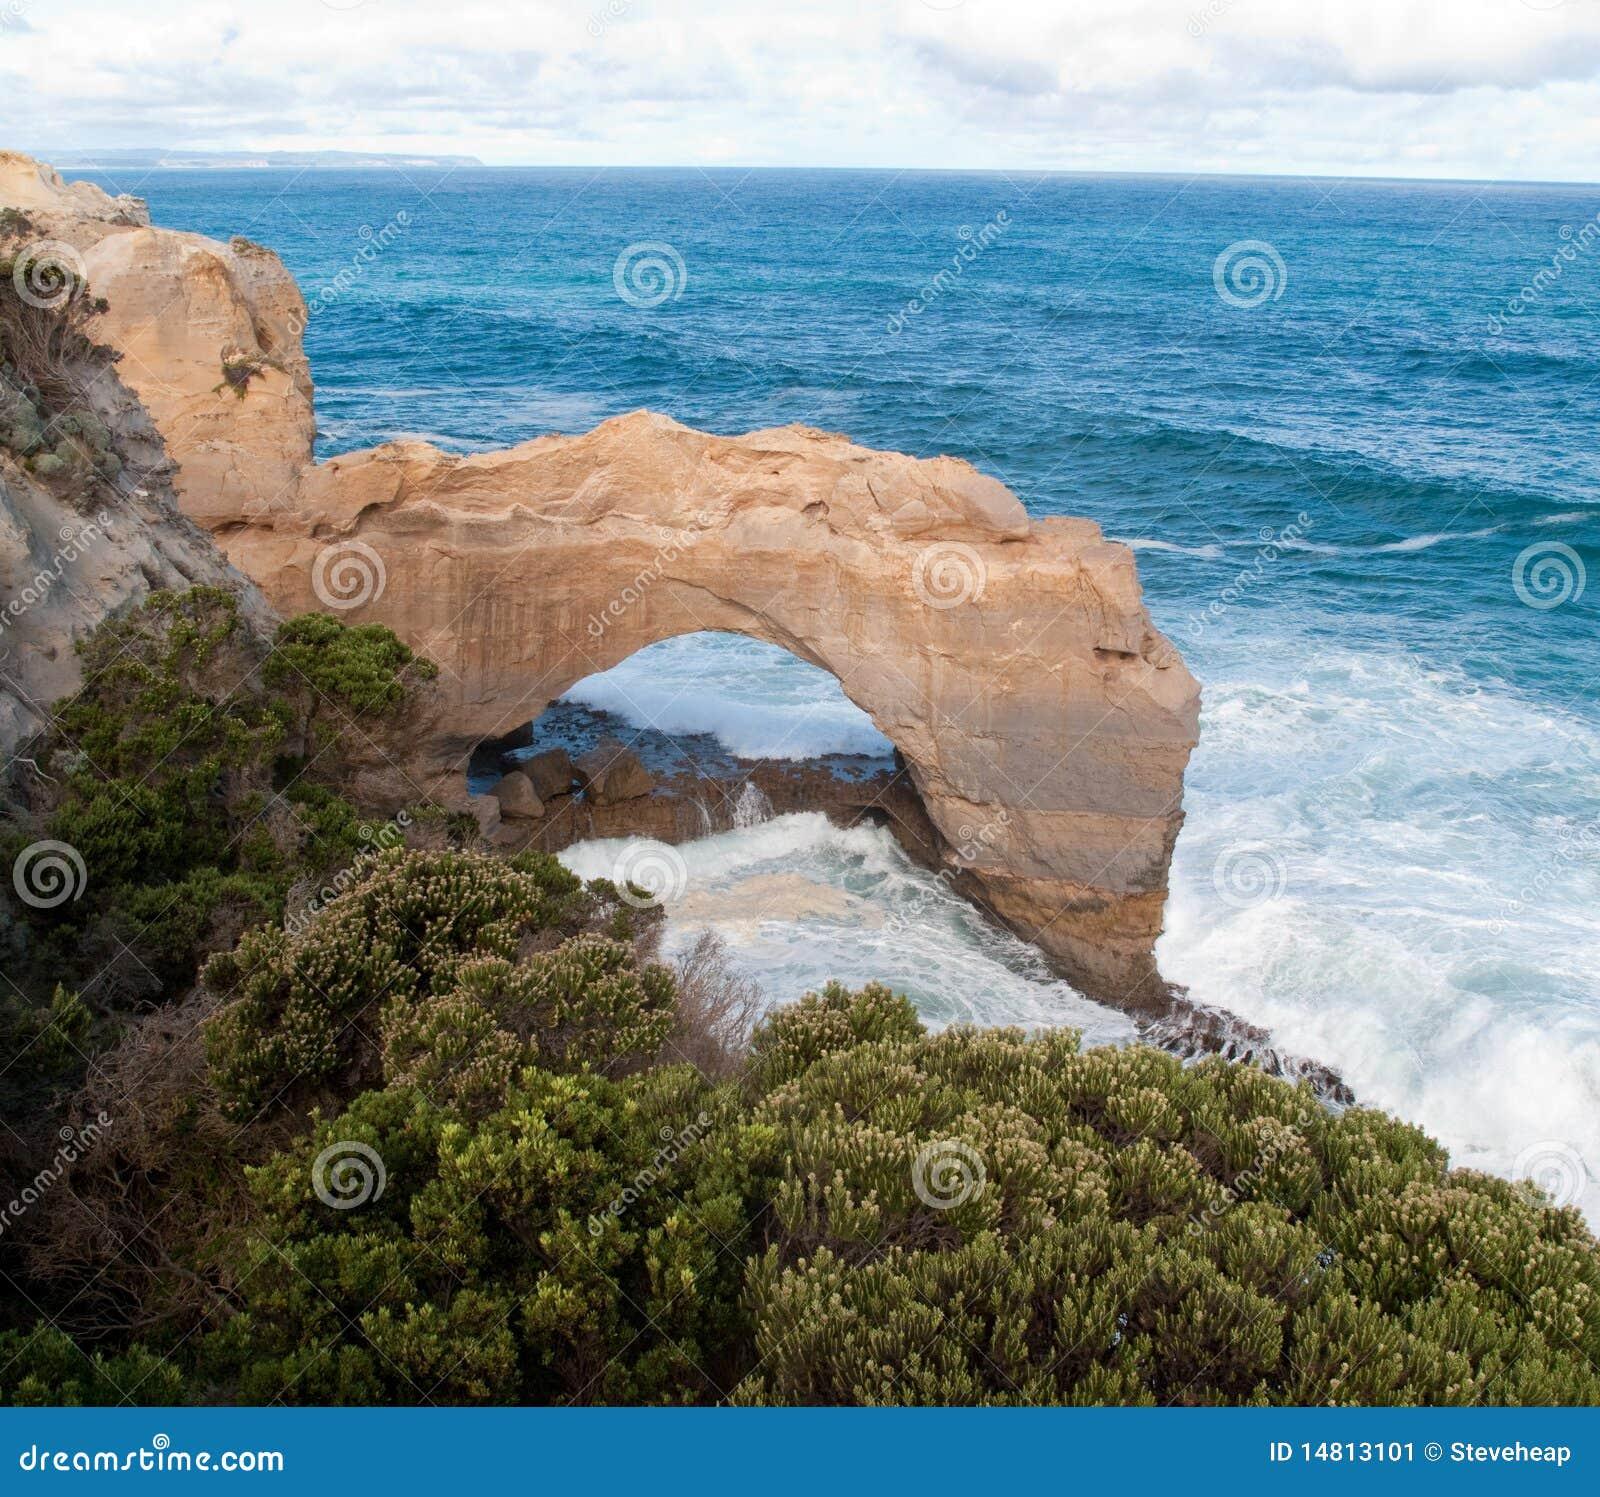 Bay of Islands Coastal Park